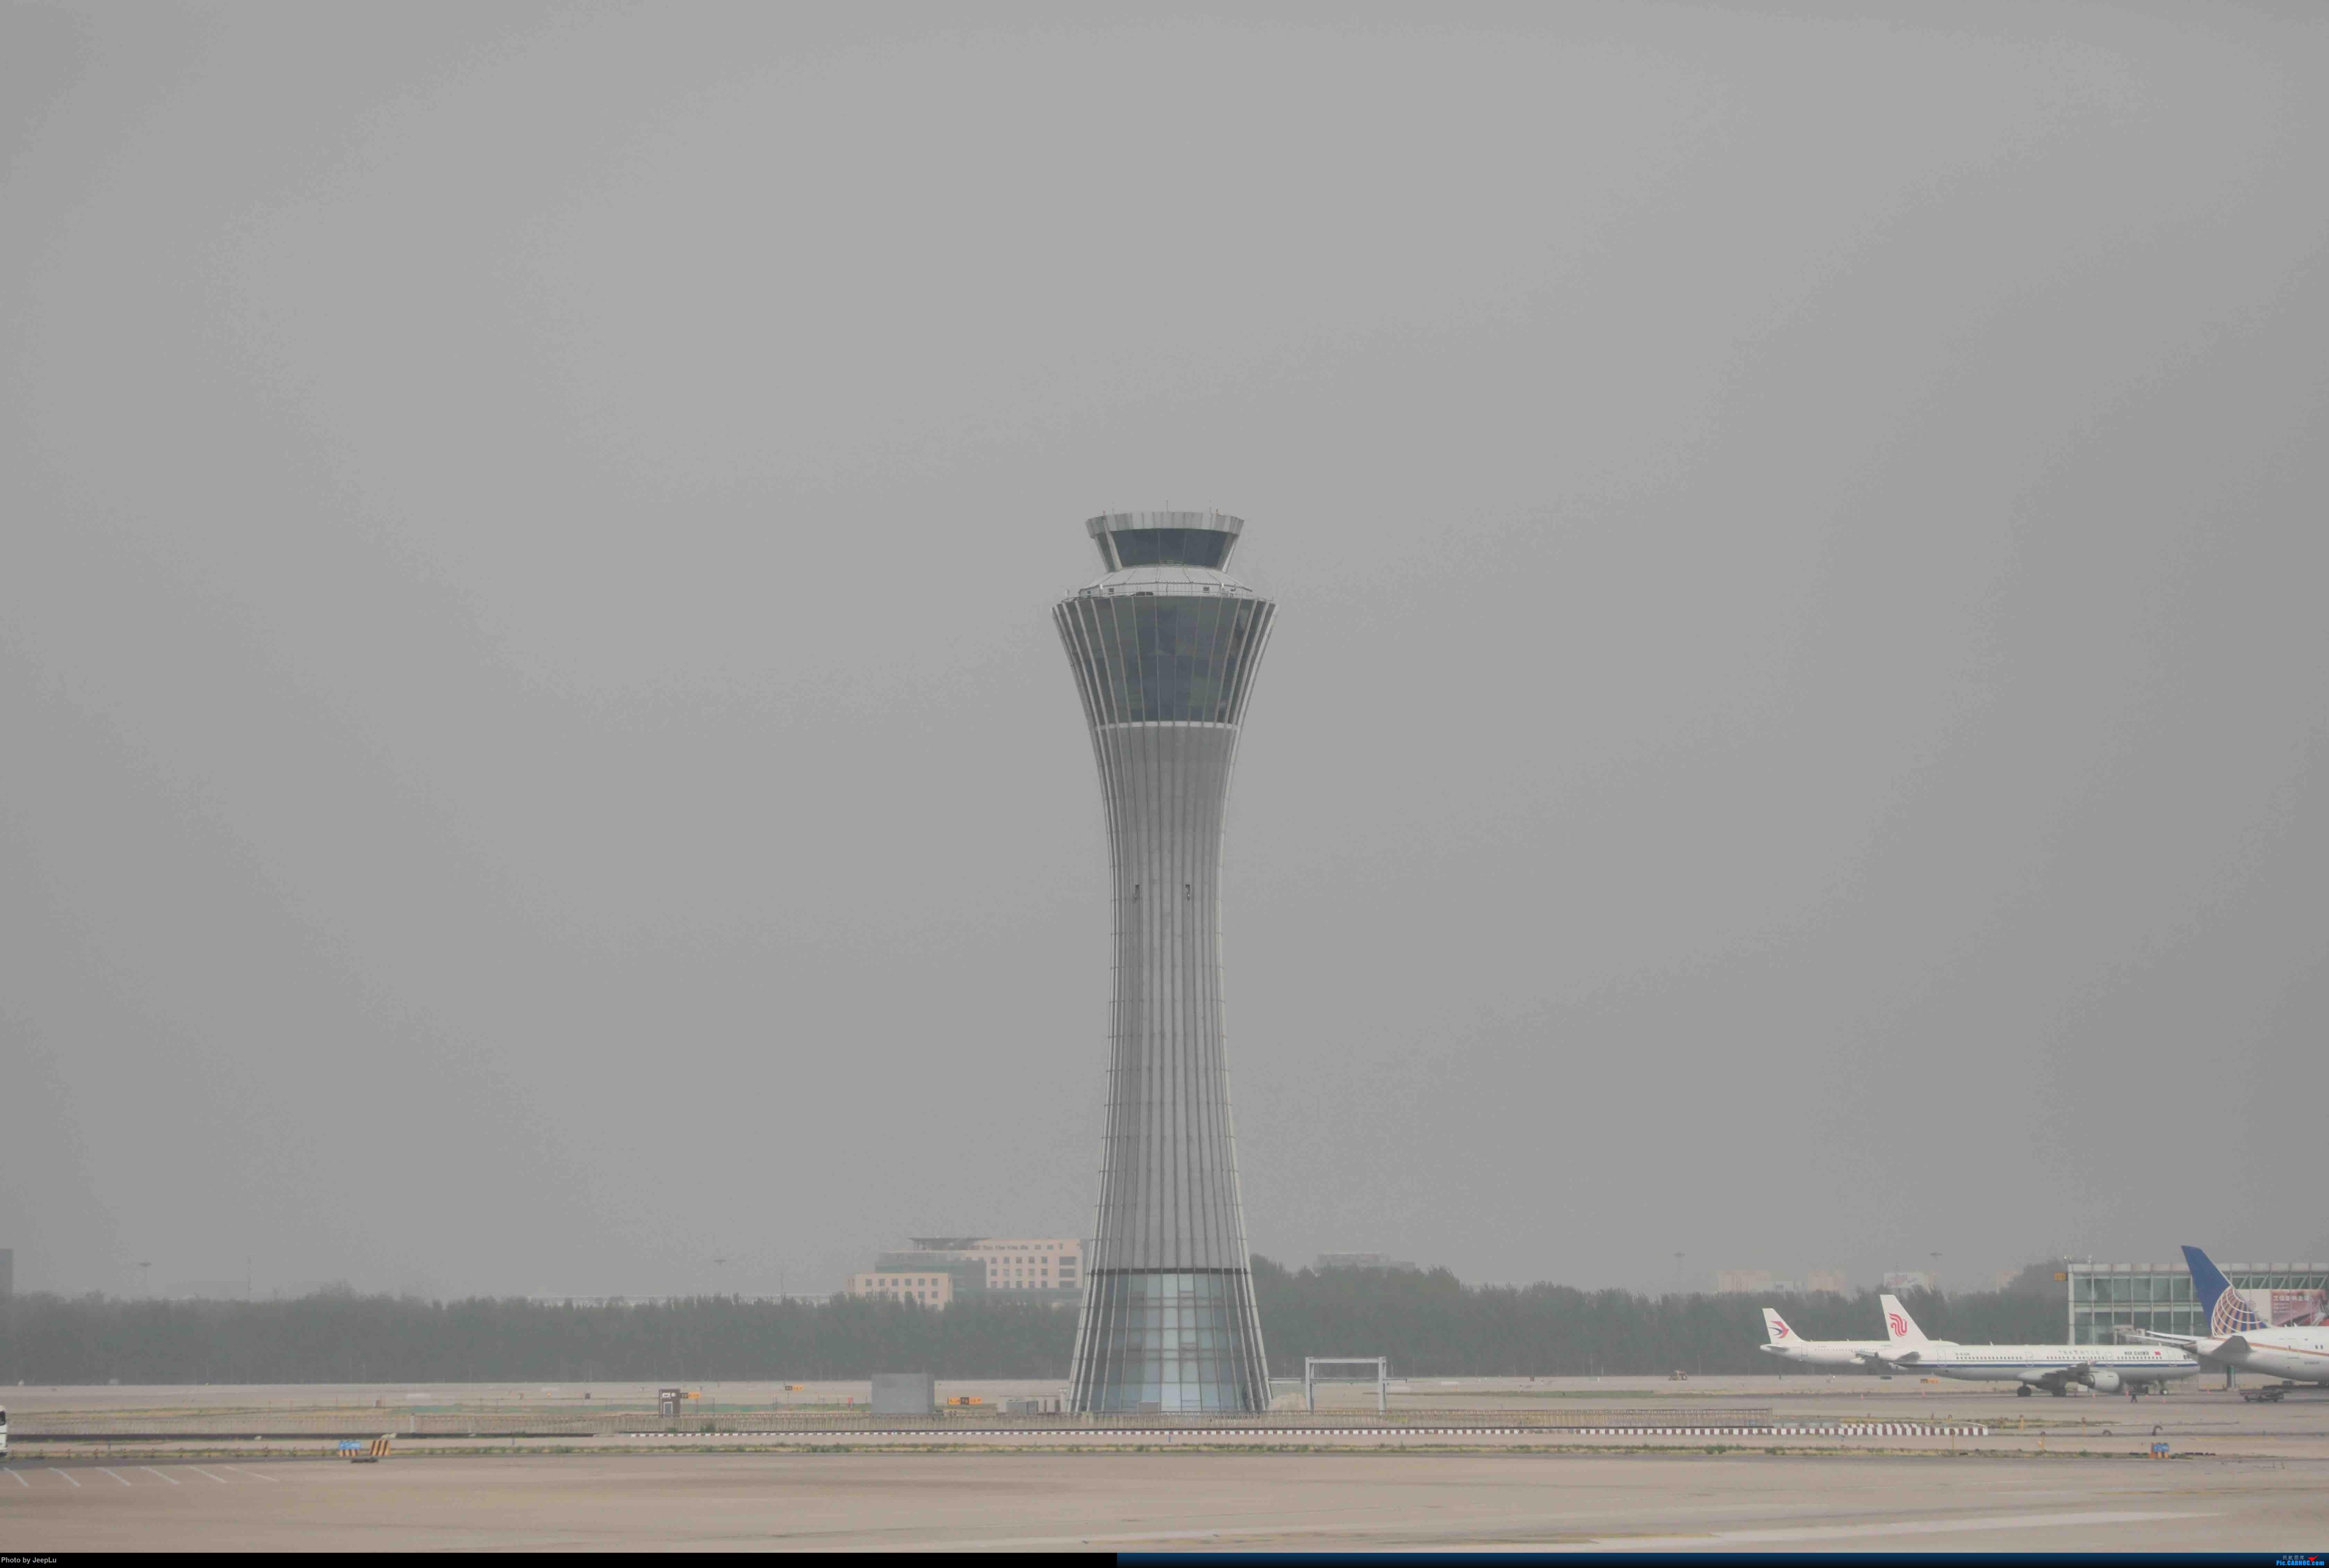 Re:[原创]佛山-东营-南苑,最后的南苑&PEK-CAN 擦航77W商务舱体验 737-8   中国北京首都国际机场